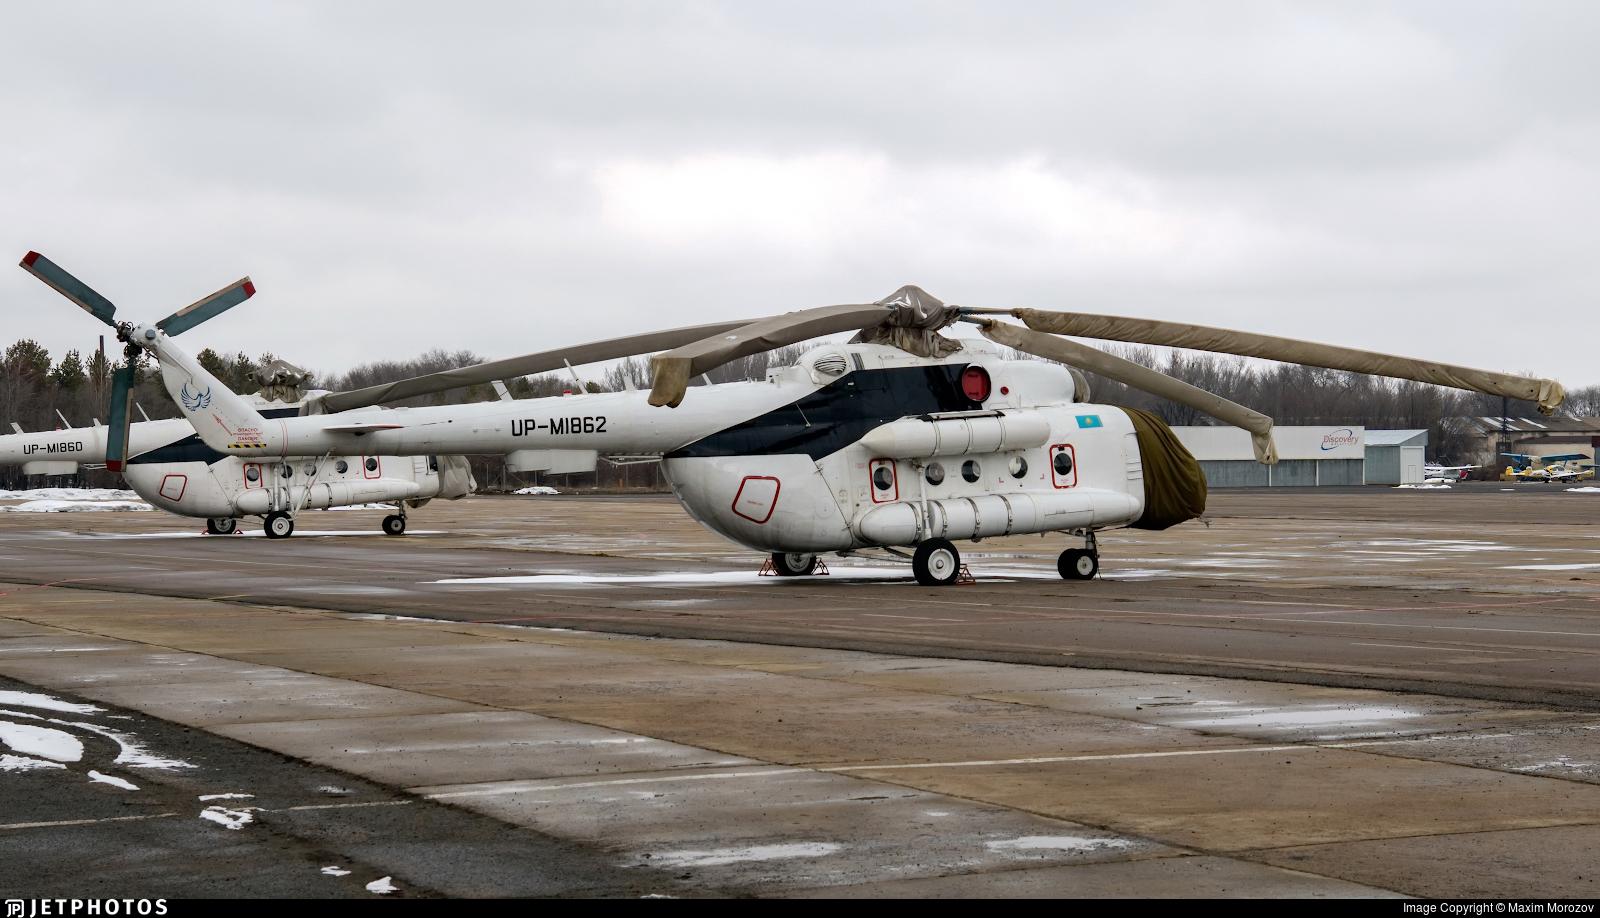 UP-MI862 - Mil Mi-8MTV-1 Hip - Kazakhstan - Government